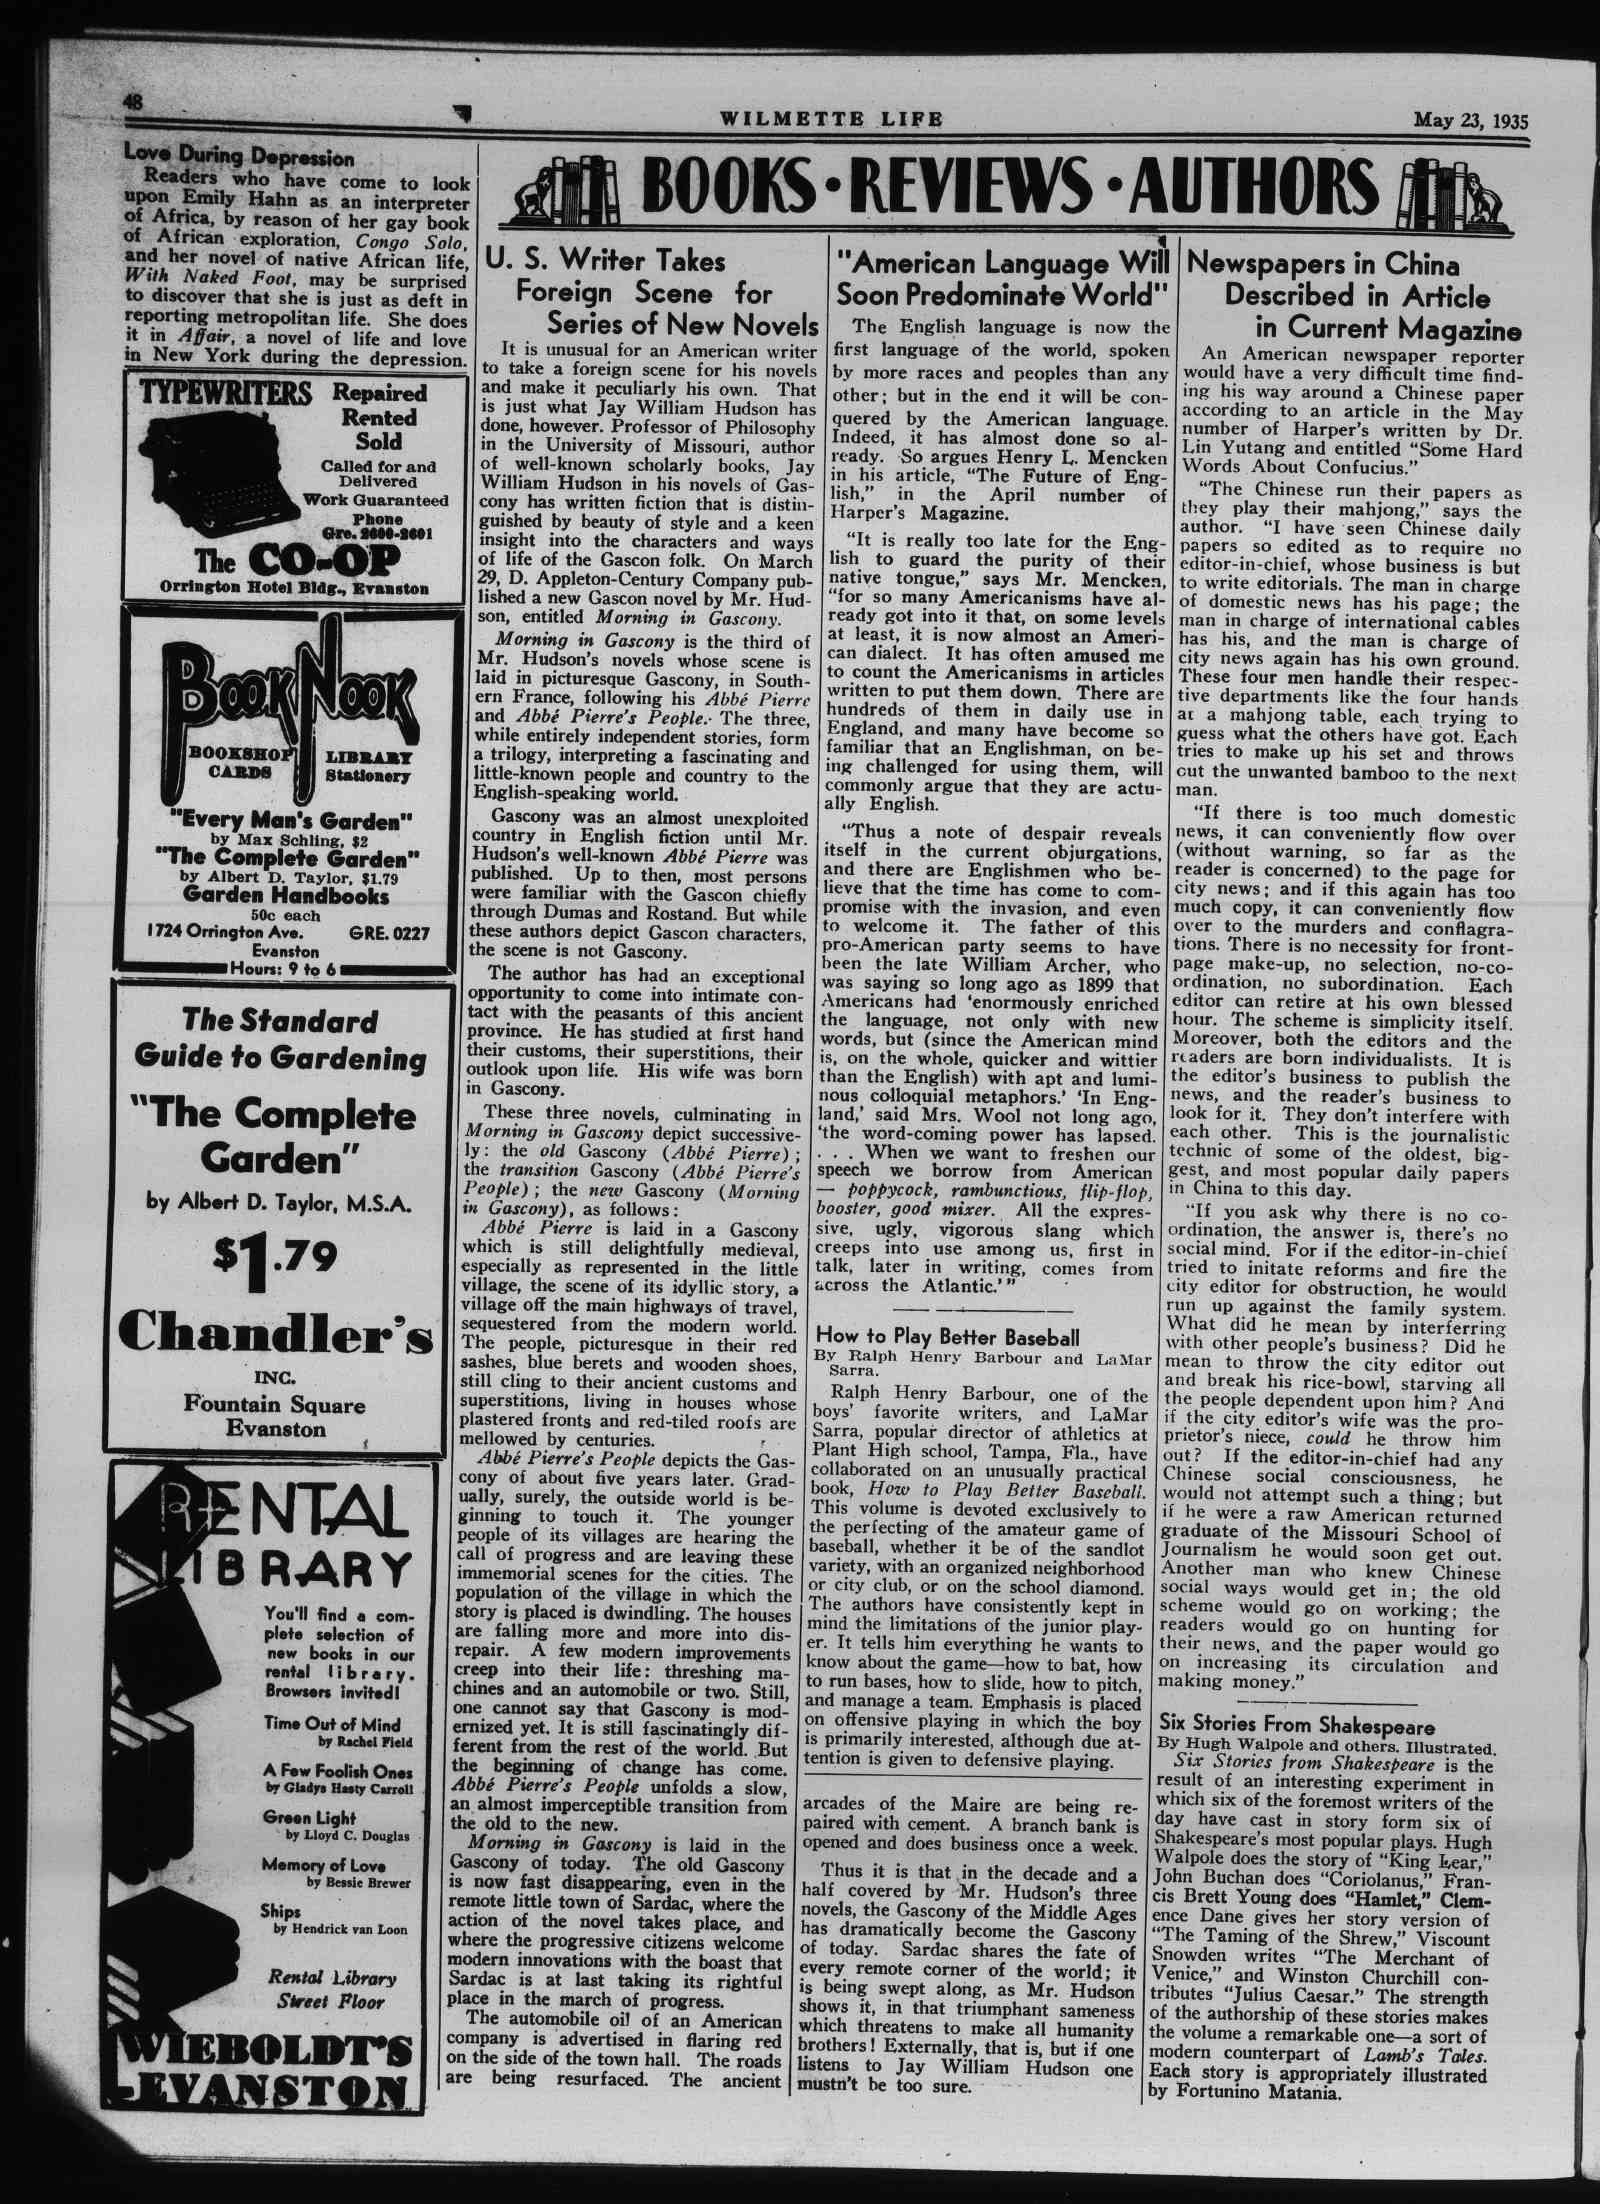 Wilmette Life (Wilmette, Illinois), 23 May 1935